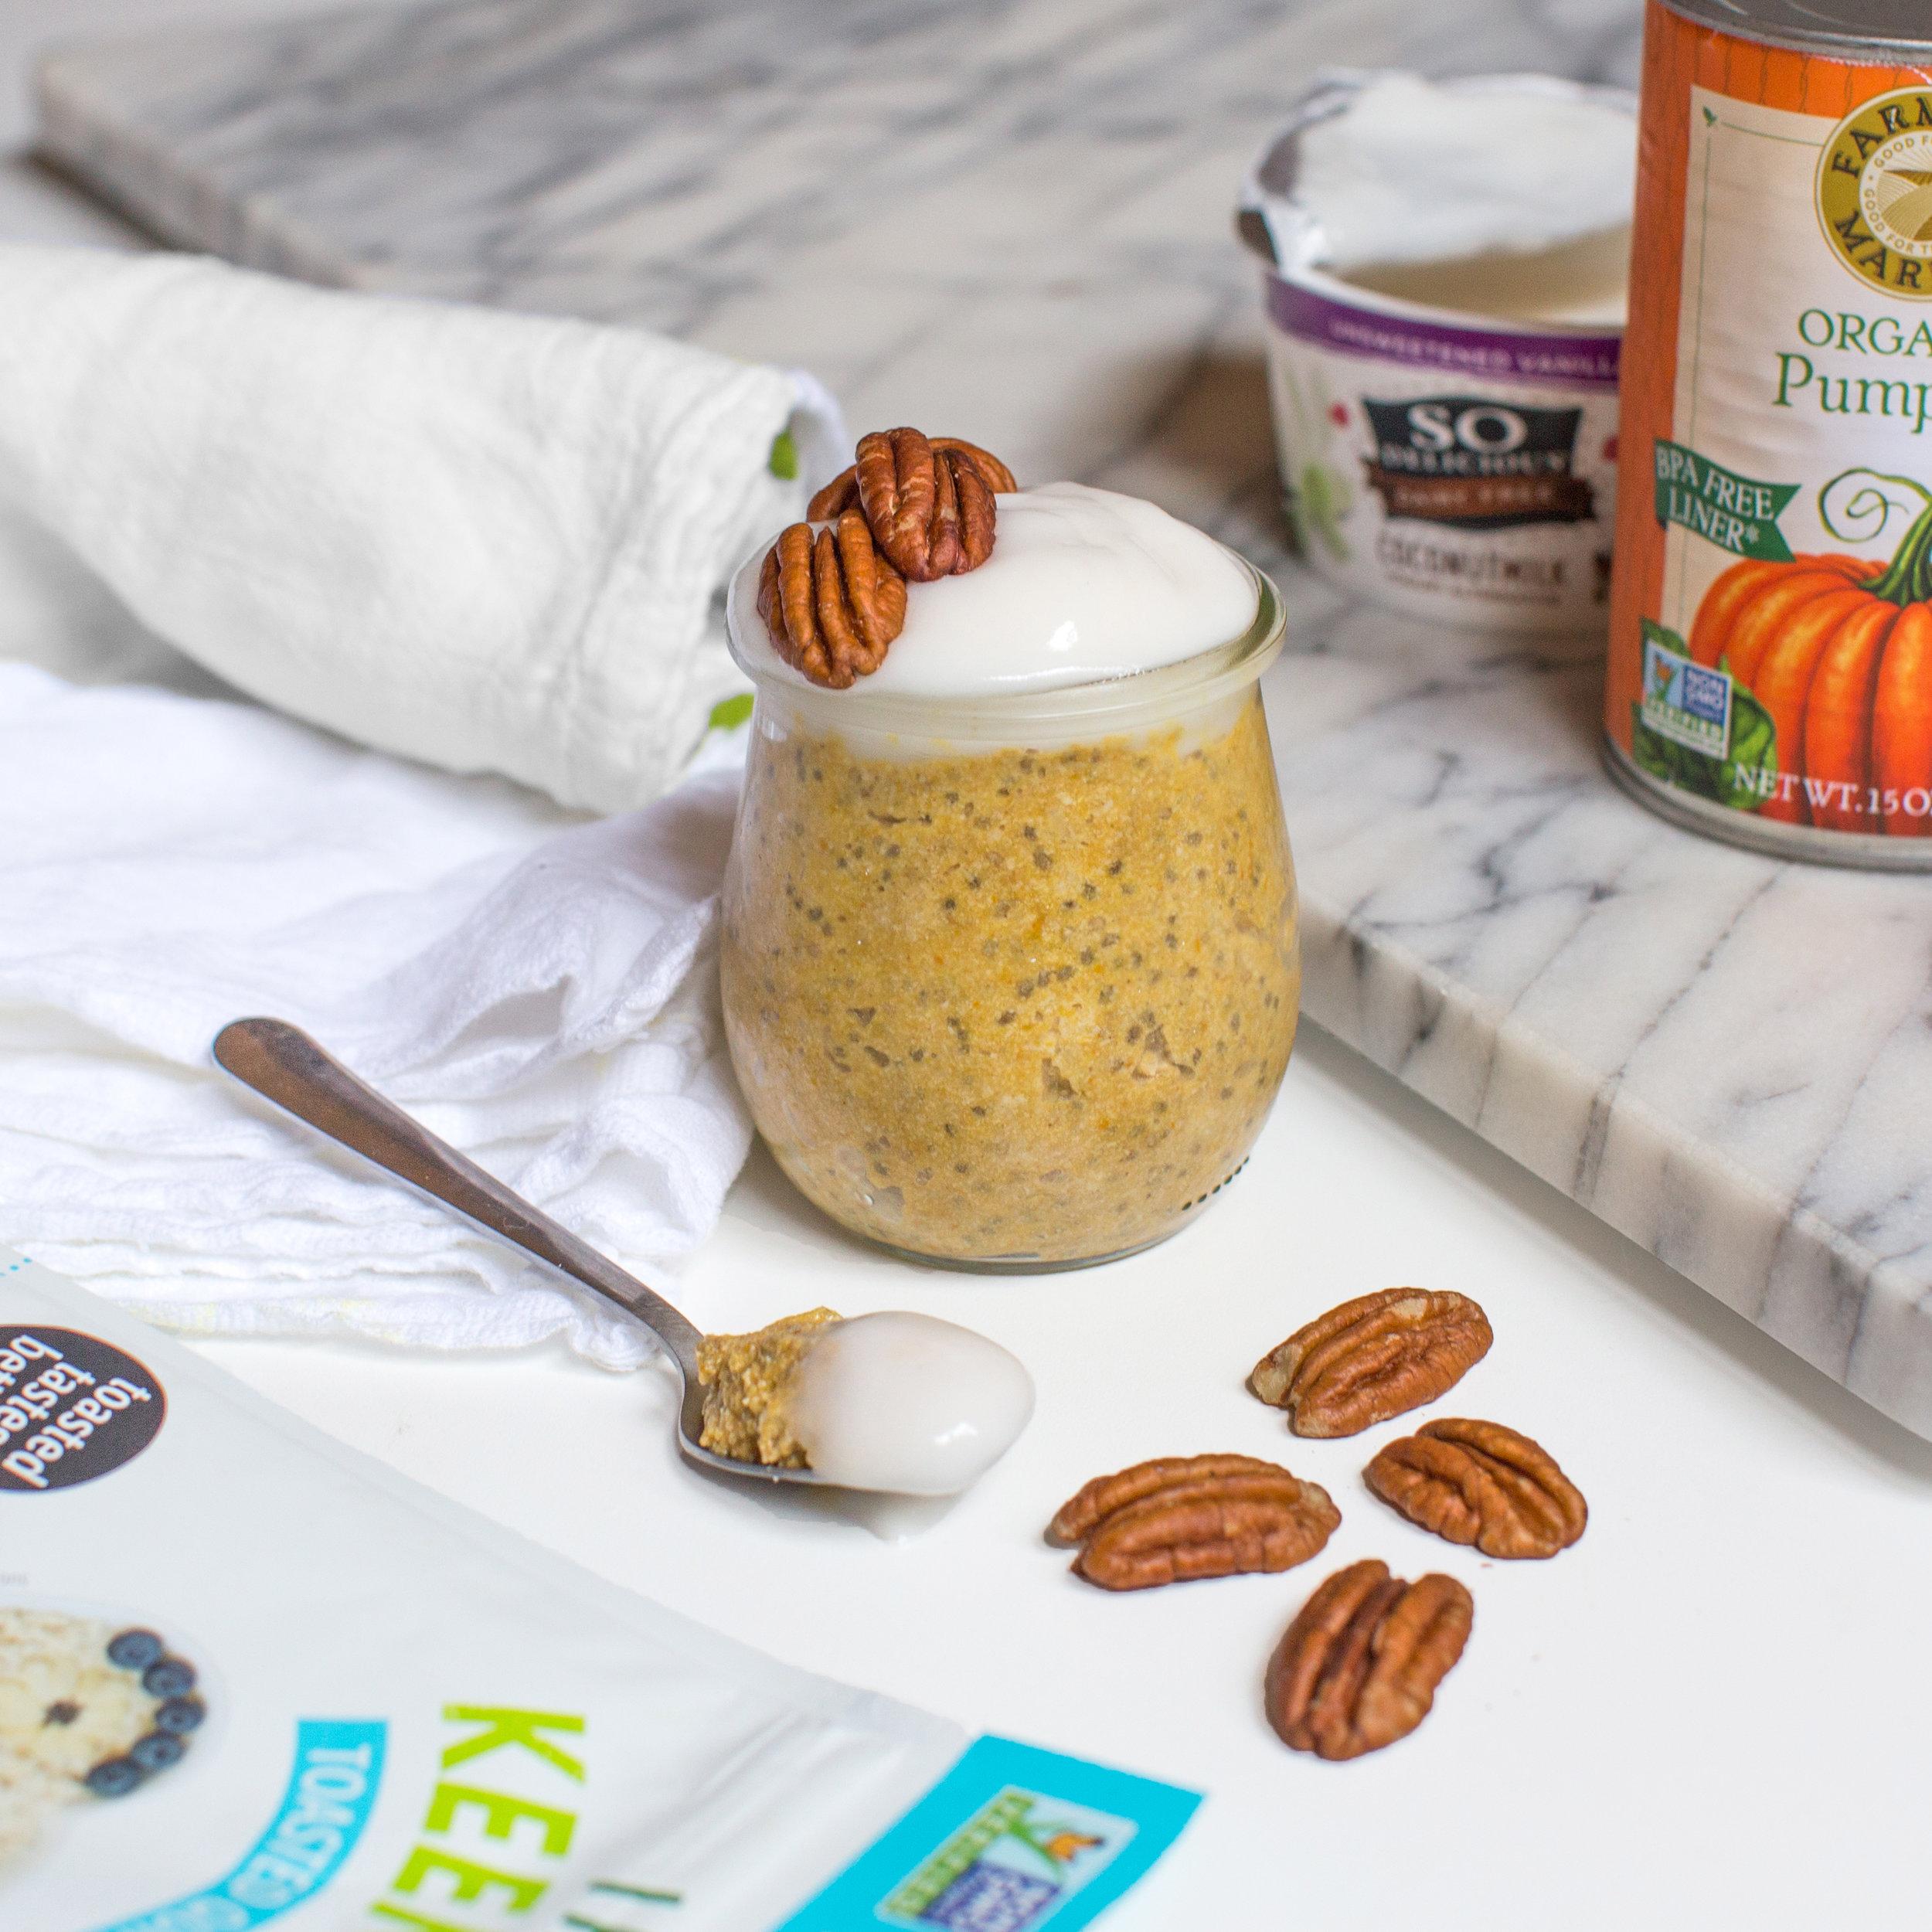 Pumpkin Spice Overnight Quinoa.jpg